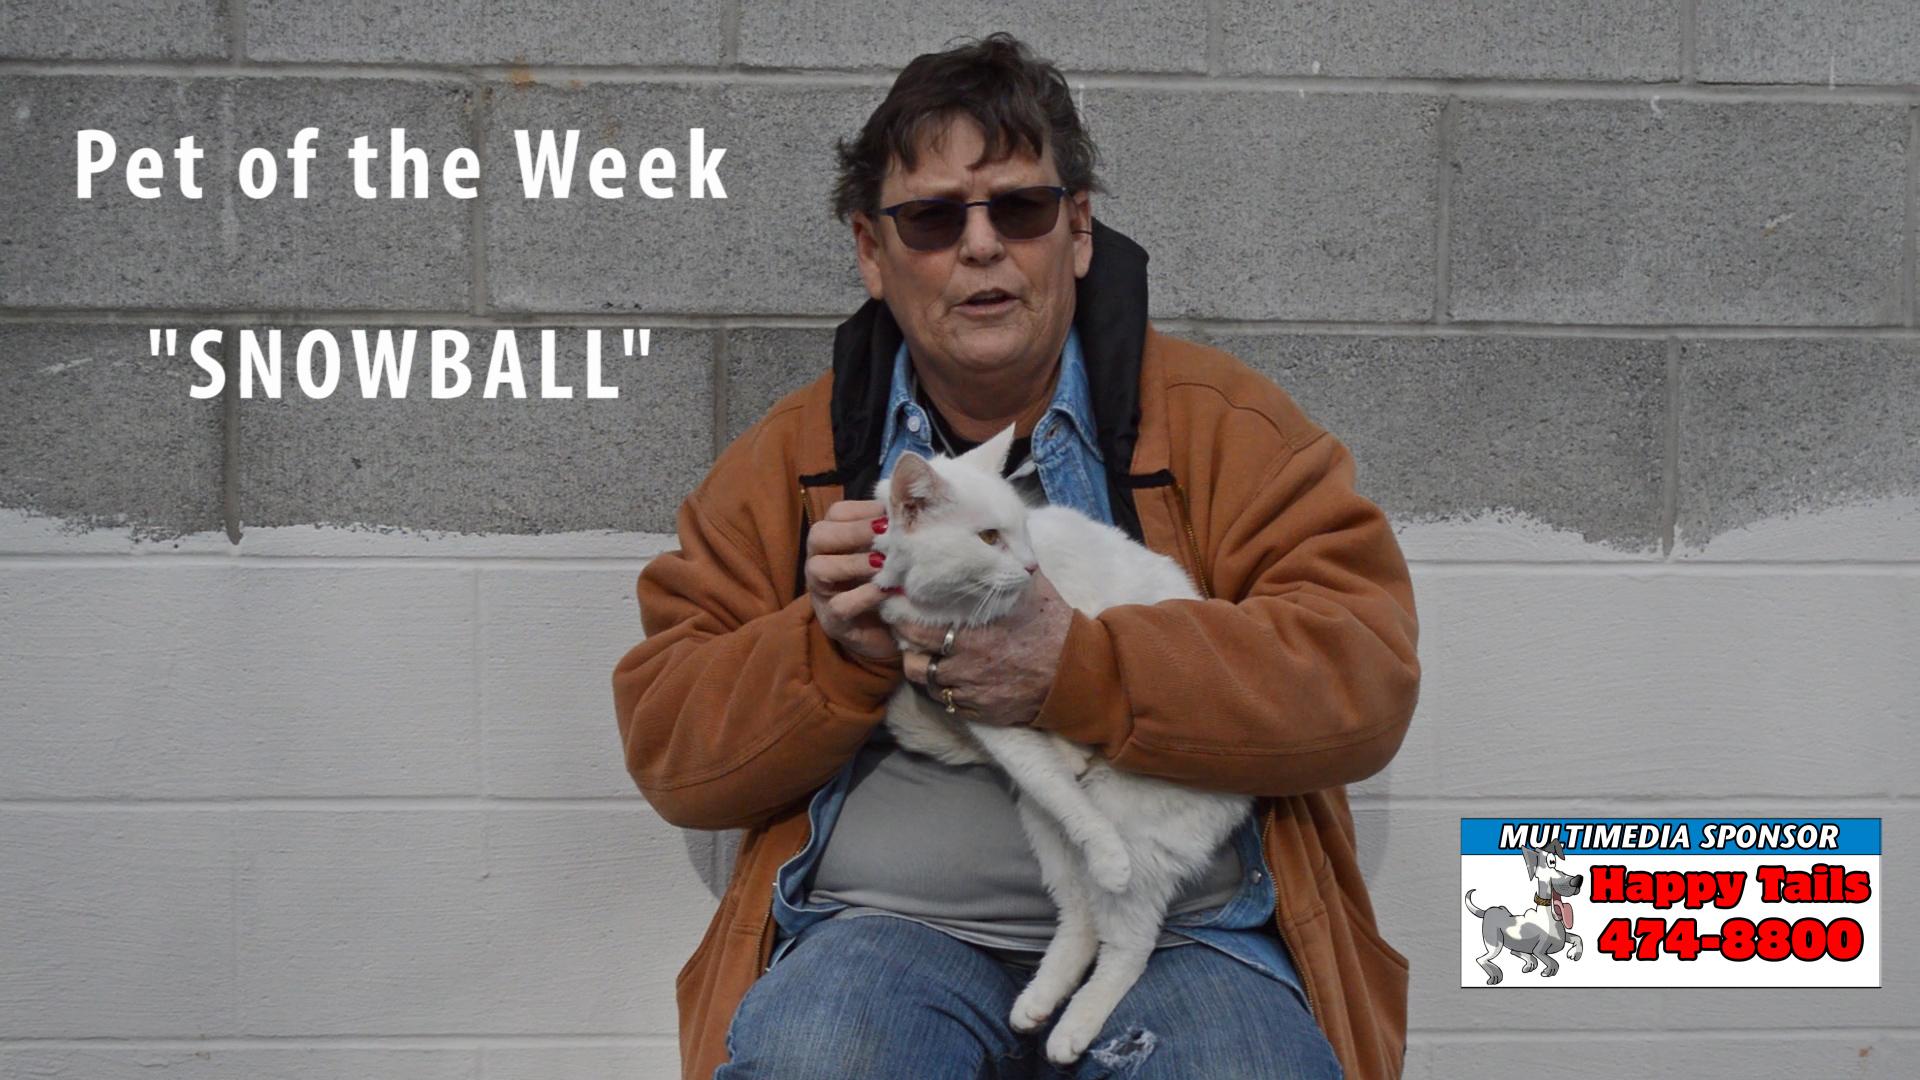 VIDEO: Pet of the Week - Snowball